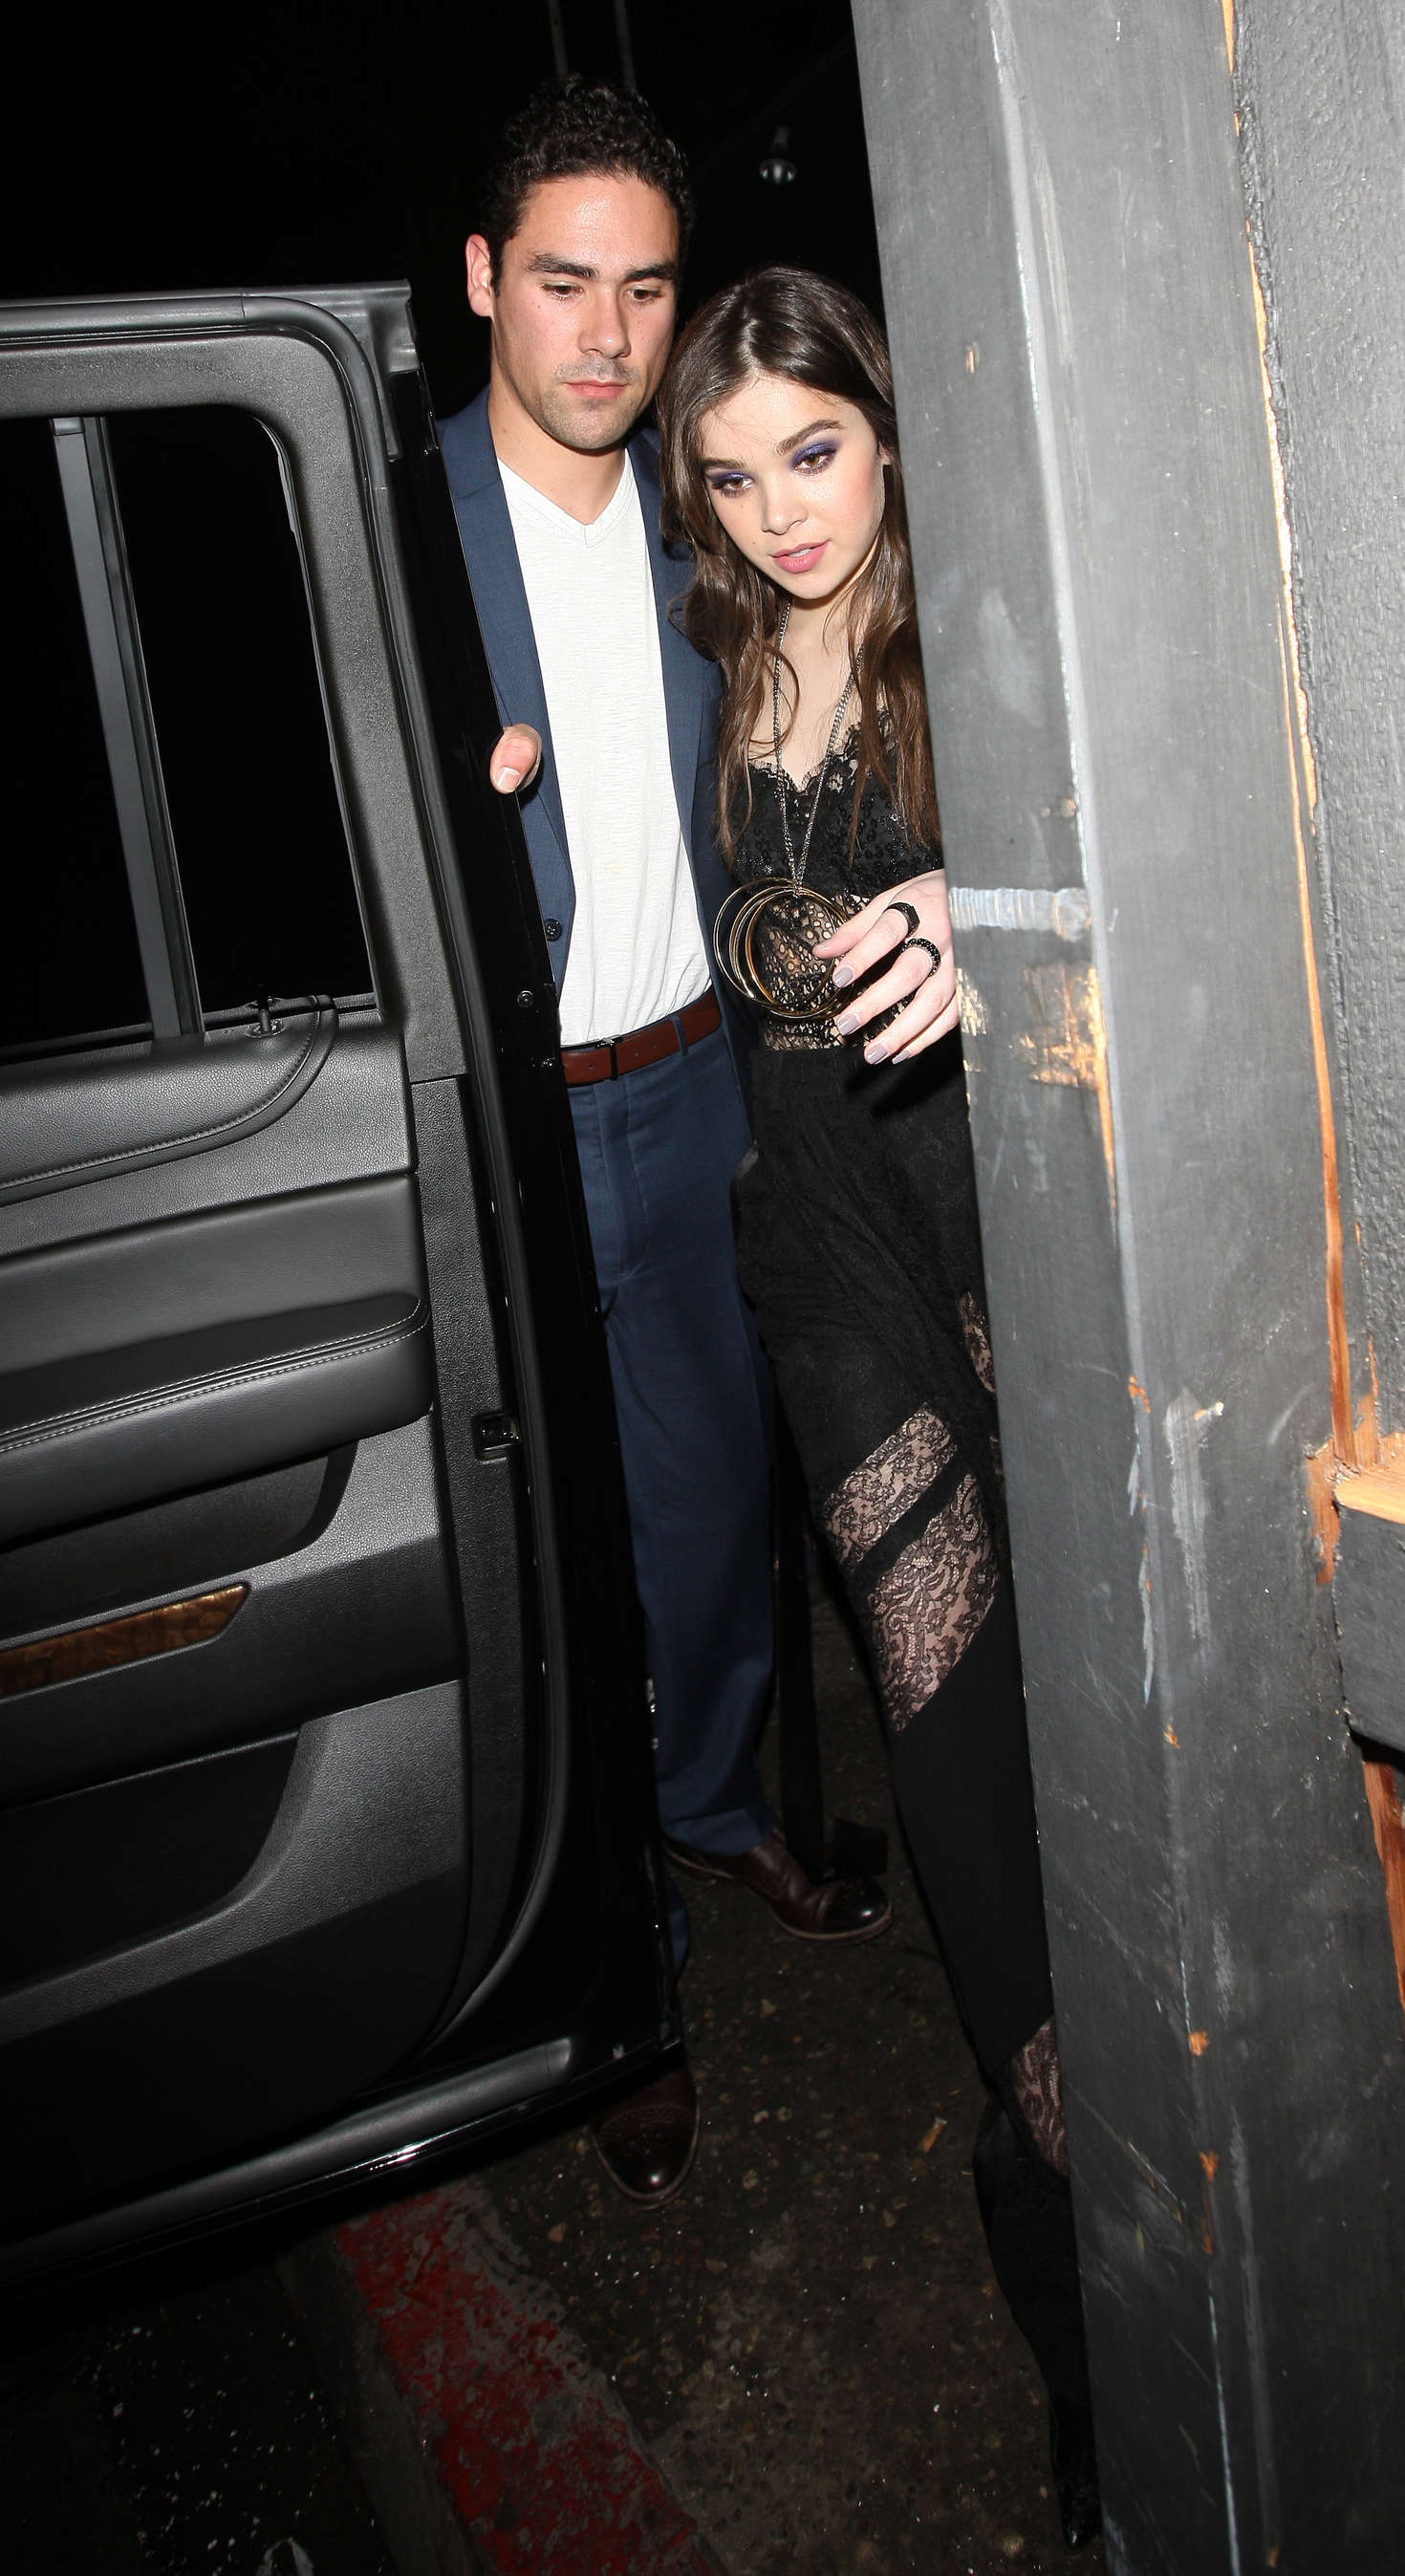 Hailee Steinfeld 2016 : Hailee Steinfeld: Leaving the Nice Guy Club -14